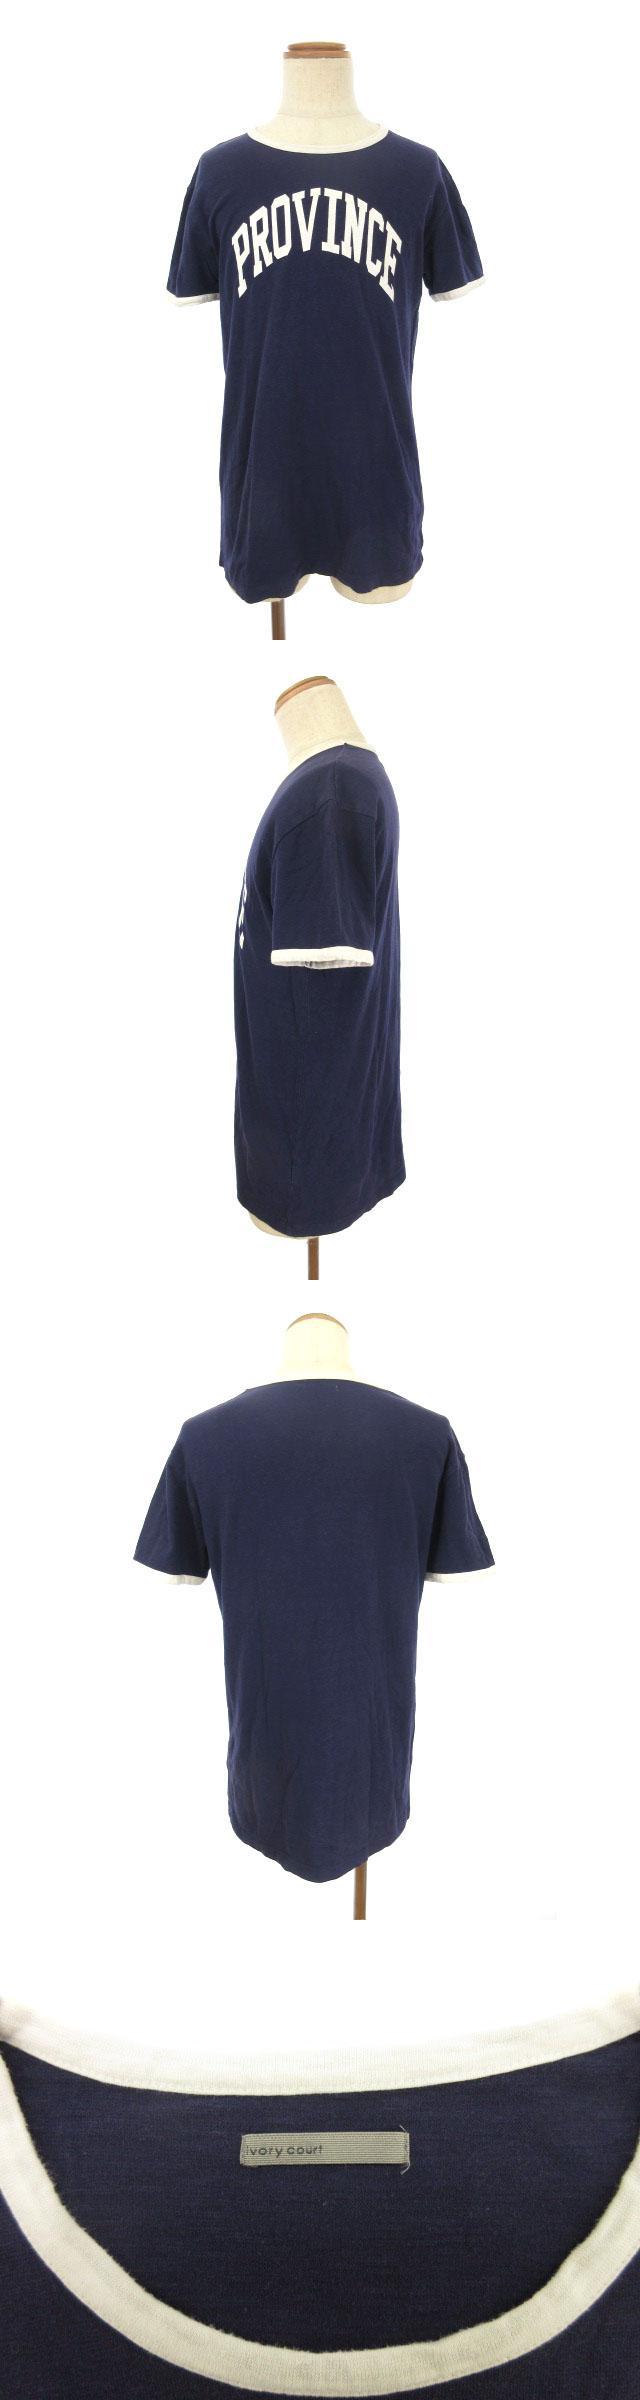 Tシャツ 半袖 プリント 英字 コットン 42 紺 ネイビー /tt